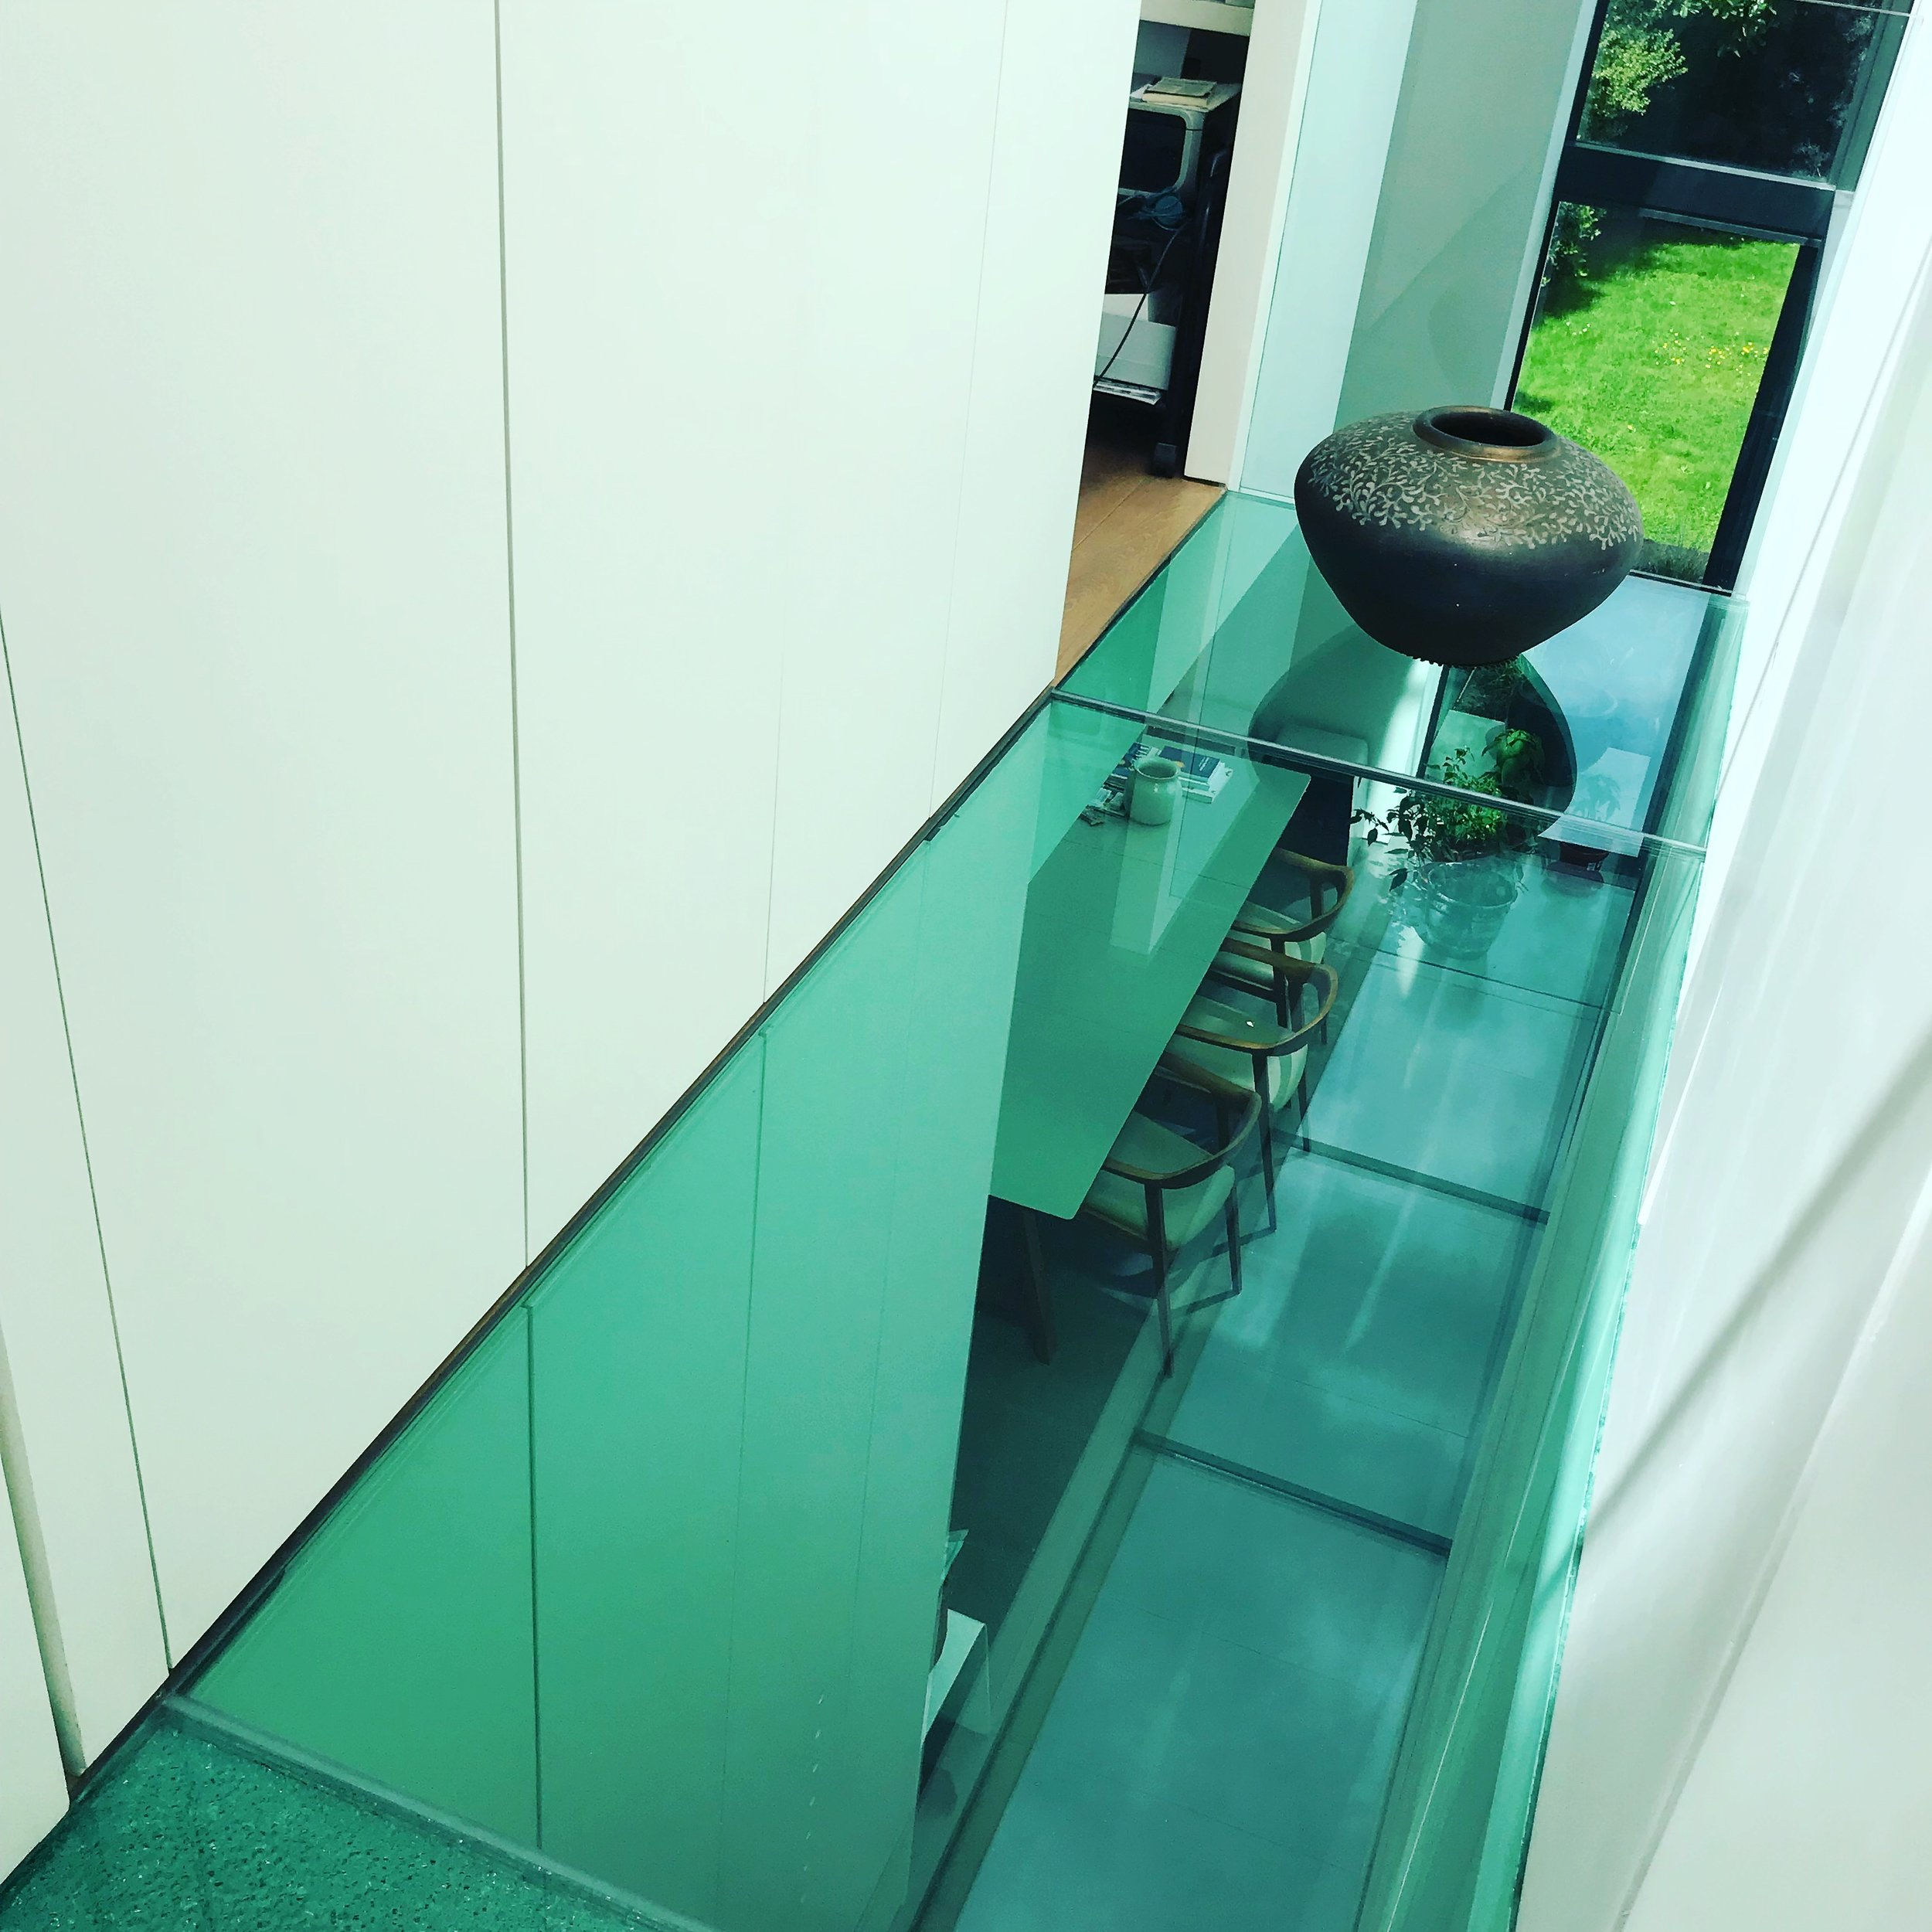 glass floor.jpeg